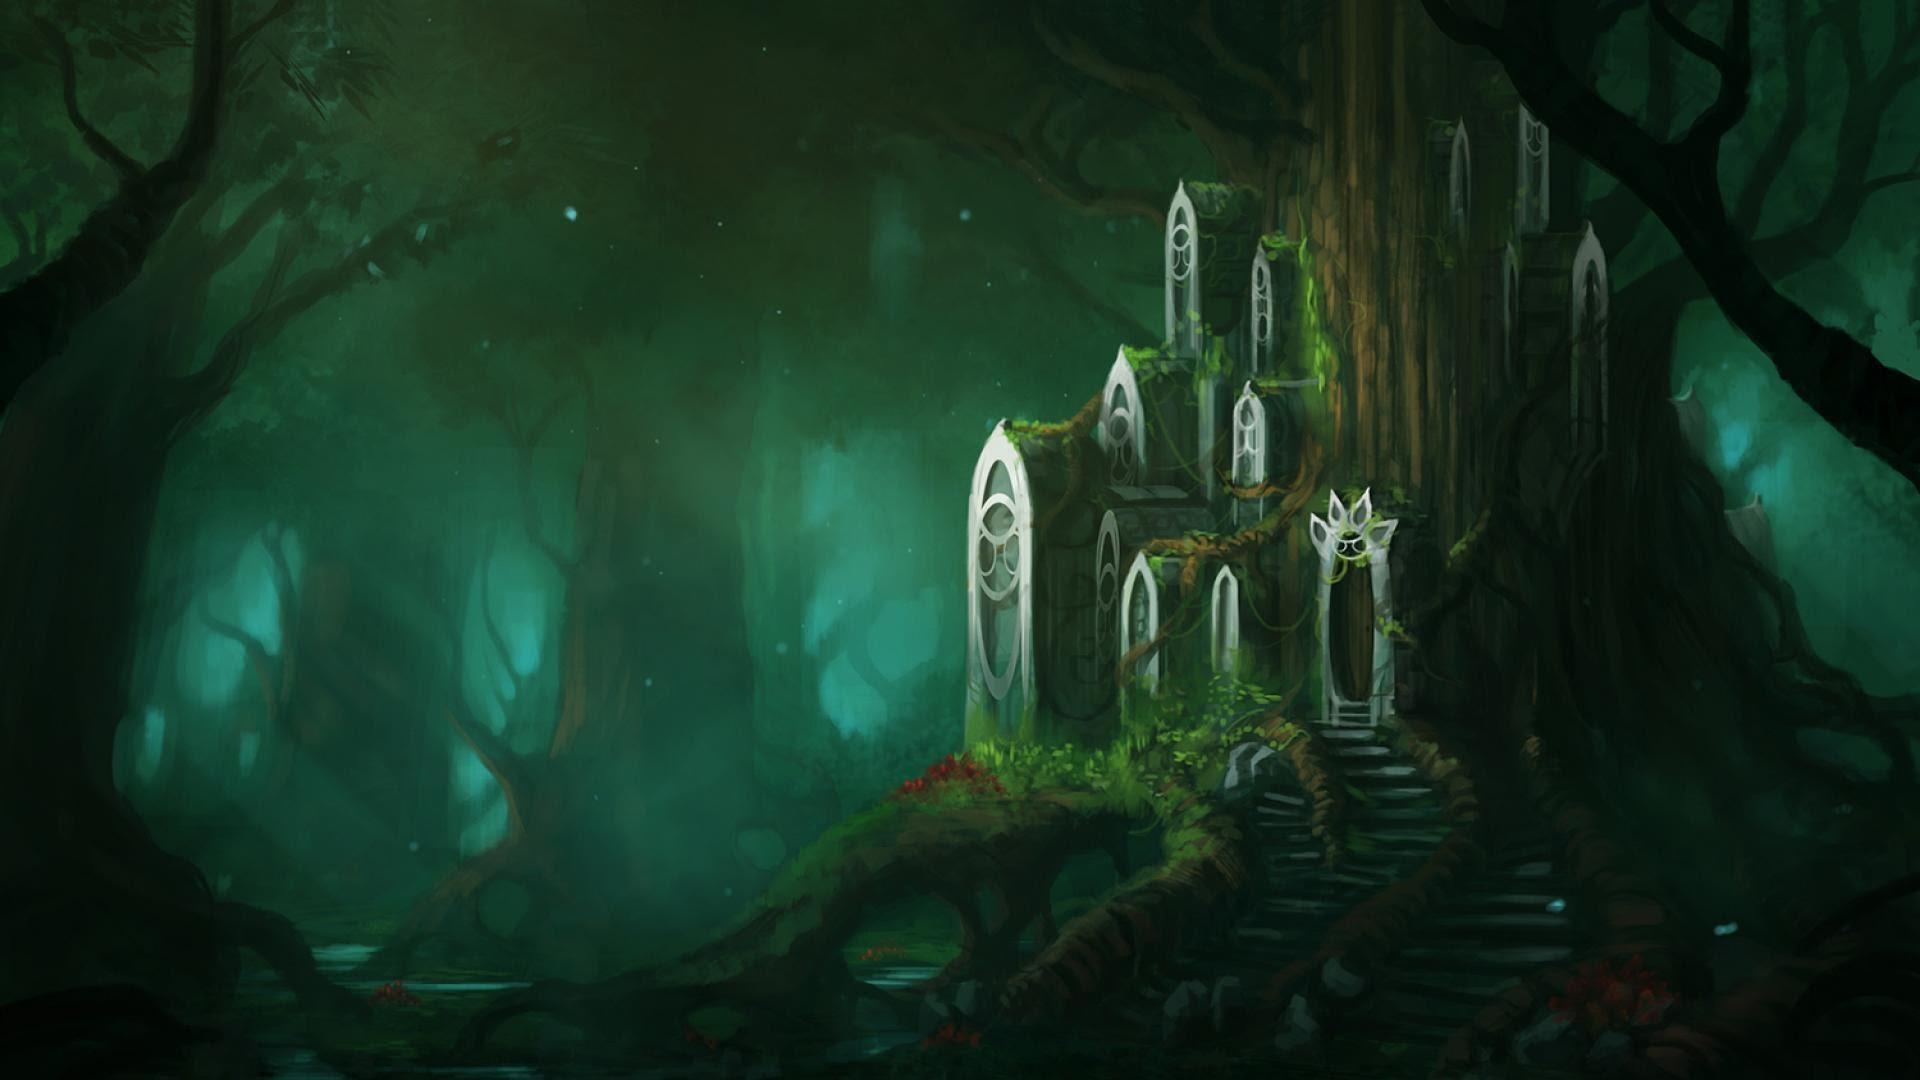 Download 6000 Wallpaper Abyss Fantasy HD